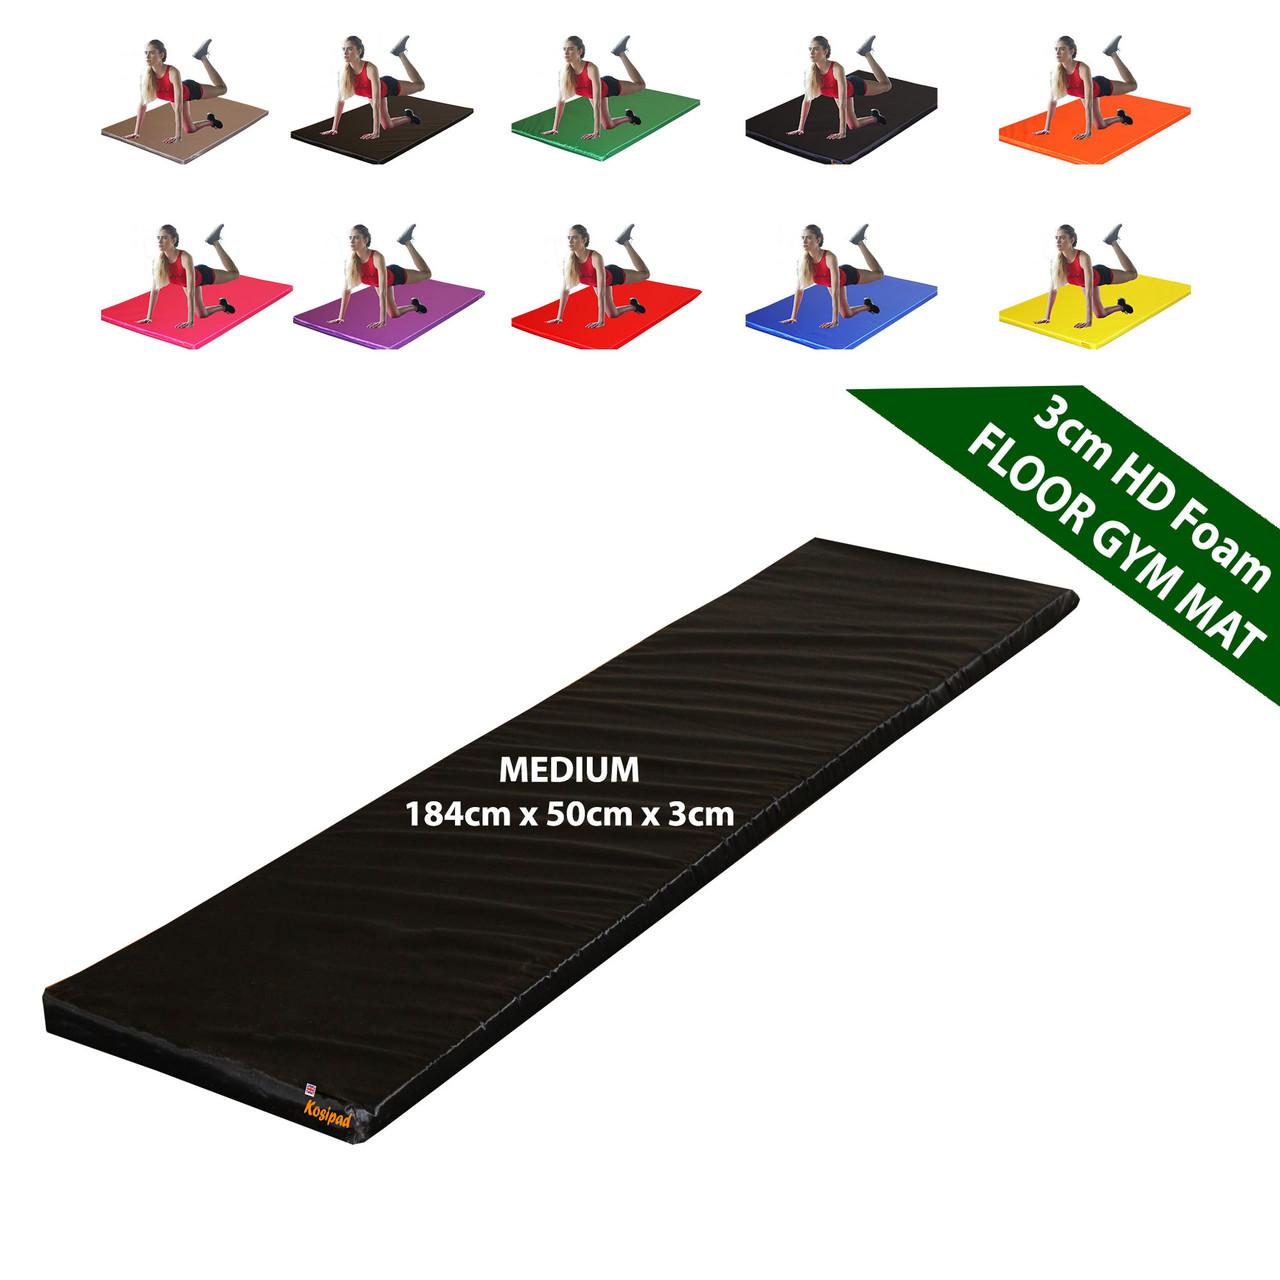 Kosipad 3cm Thick foam floor gym crash mats Black Medium